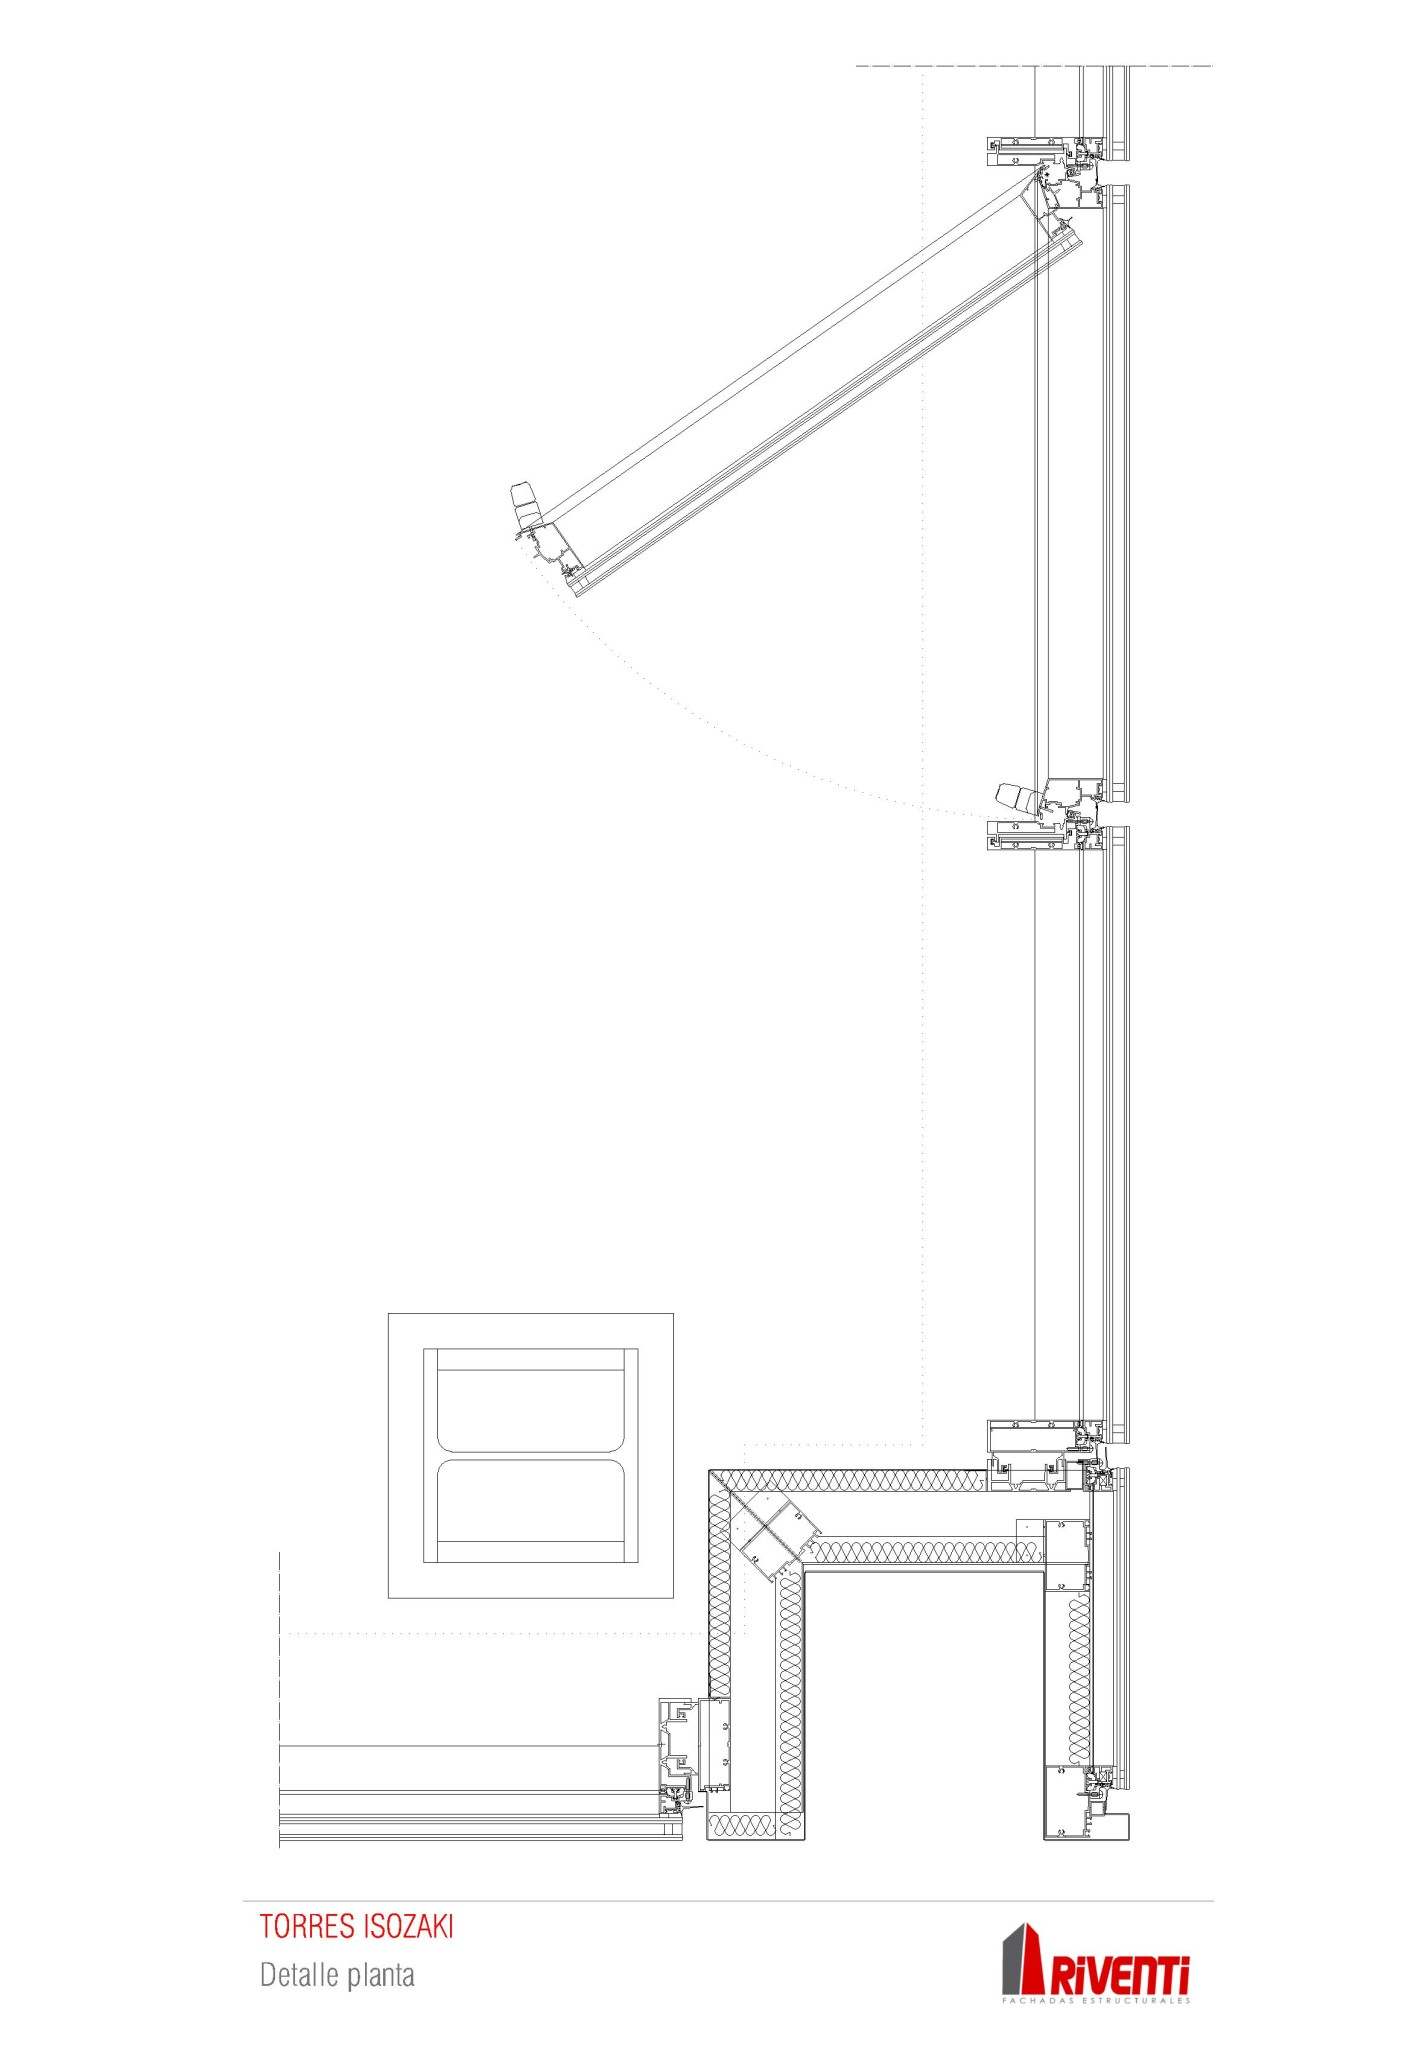 torres-isozaki-atea-muro-cortina-modular-fachada-riventi_planta_detalle-constructivo